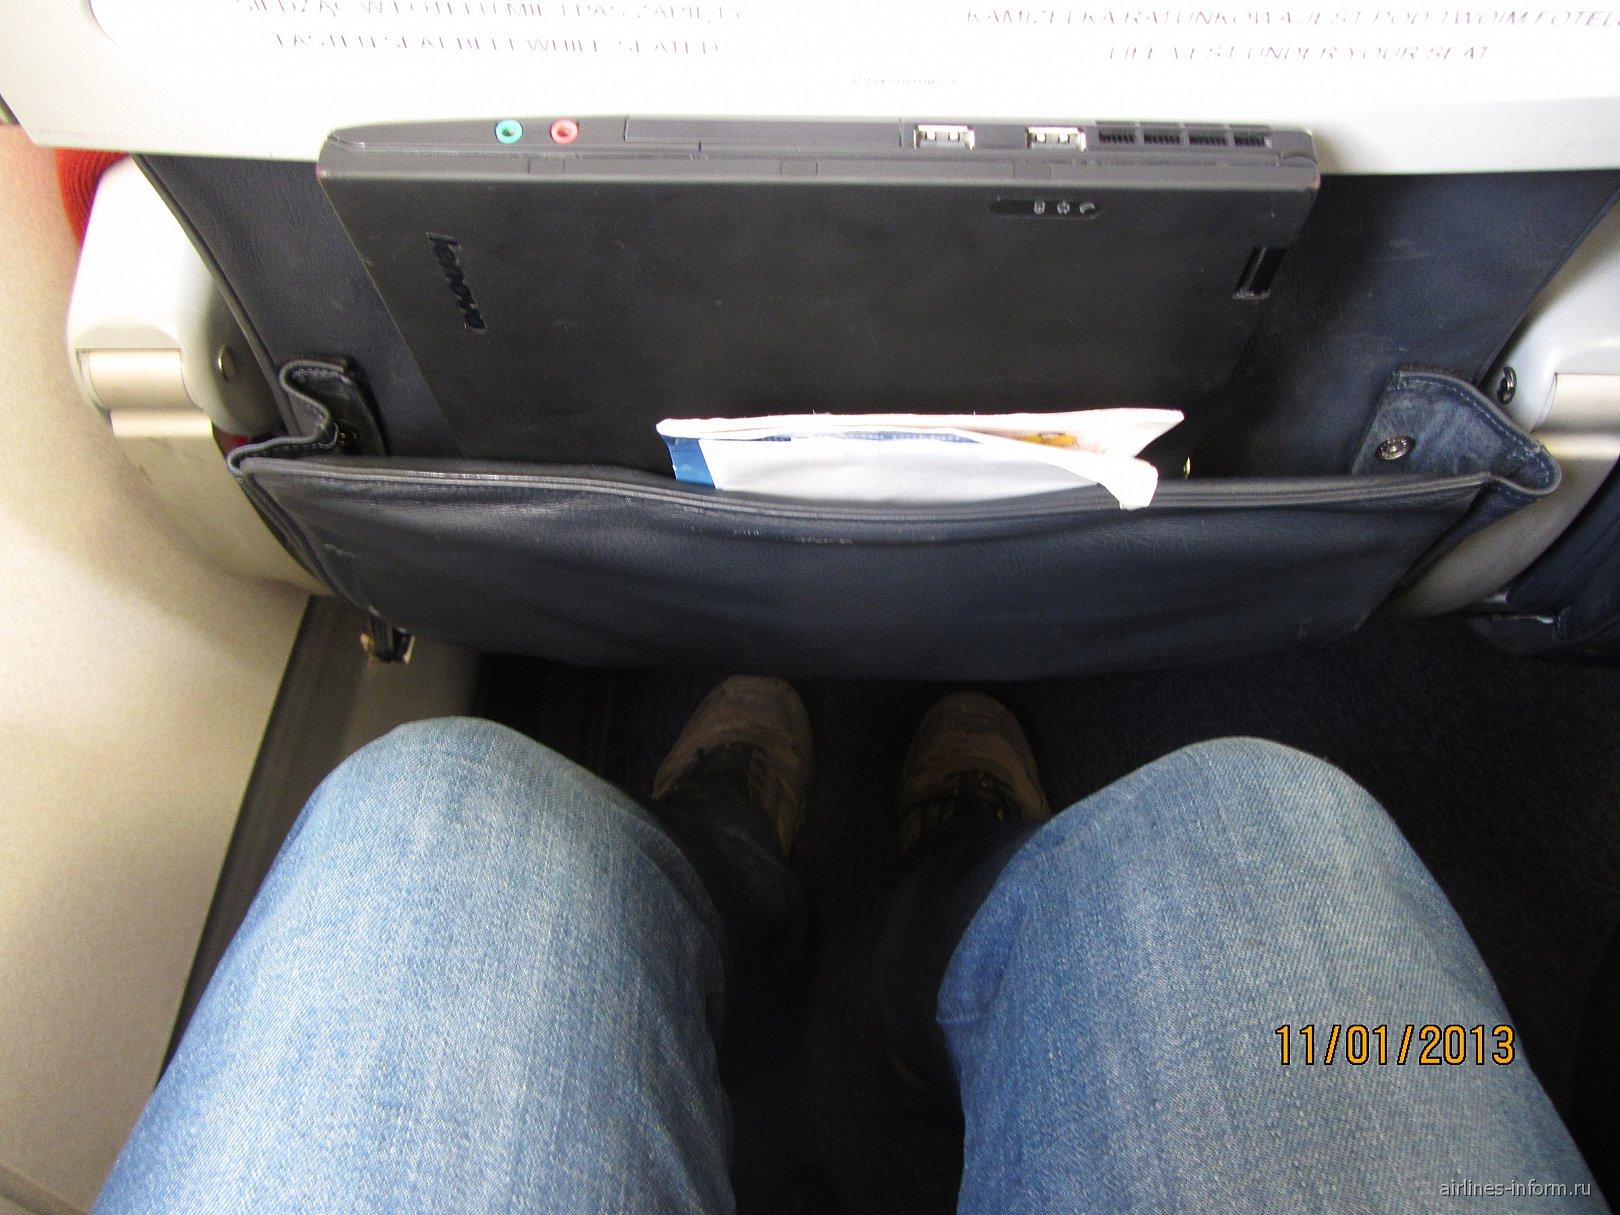 Кресла самолета Embraer 175 авиакомпании LOT